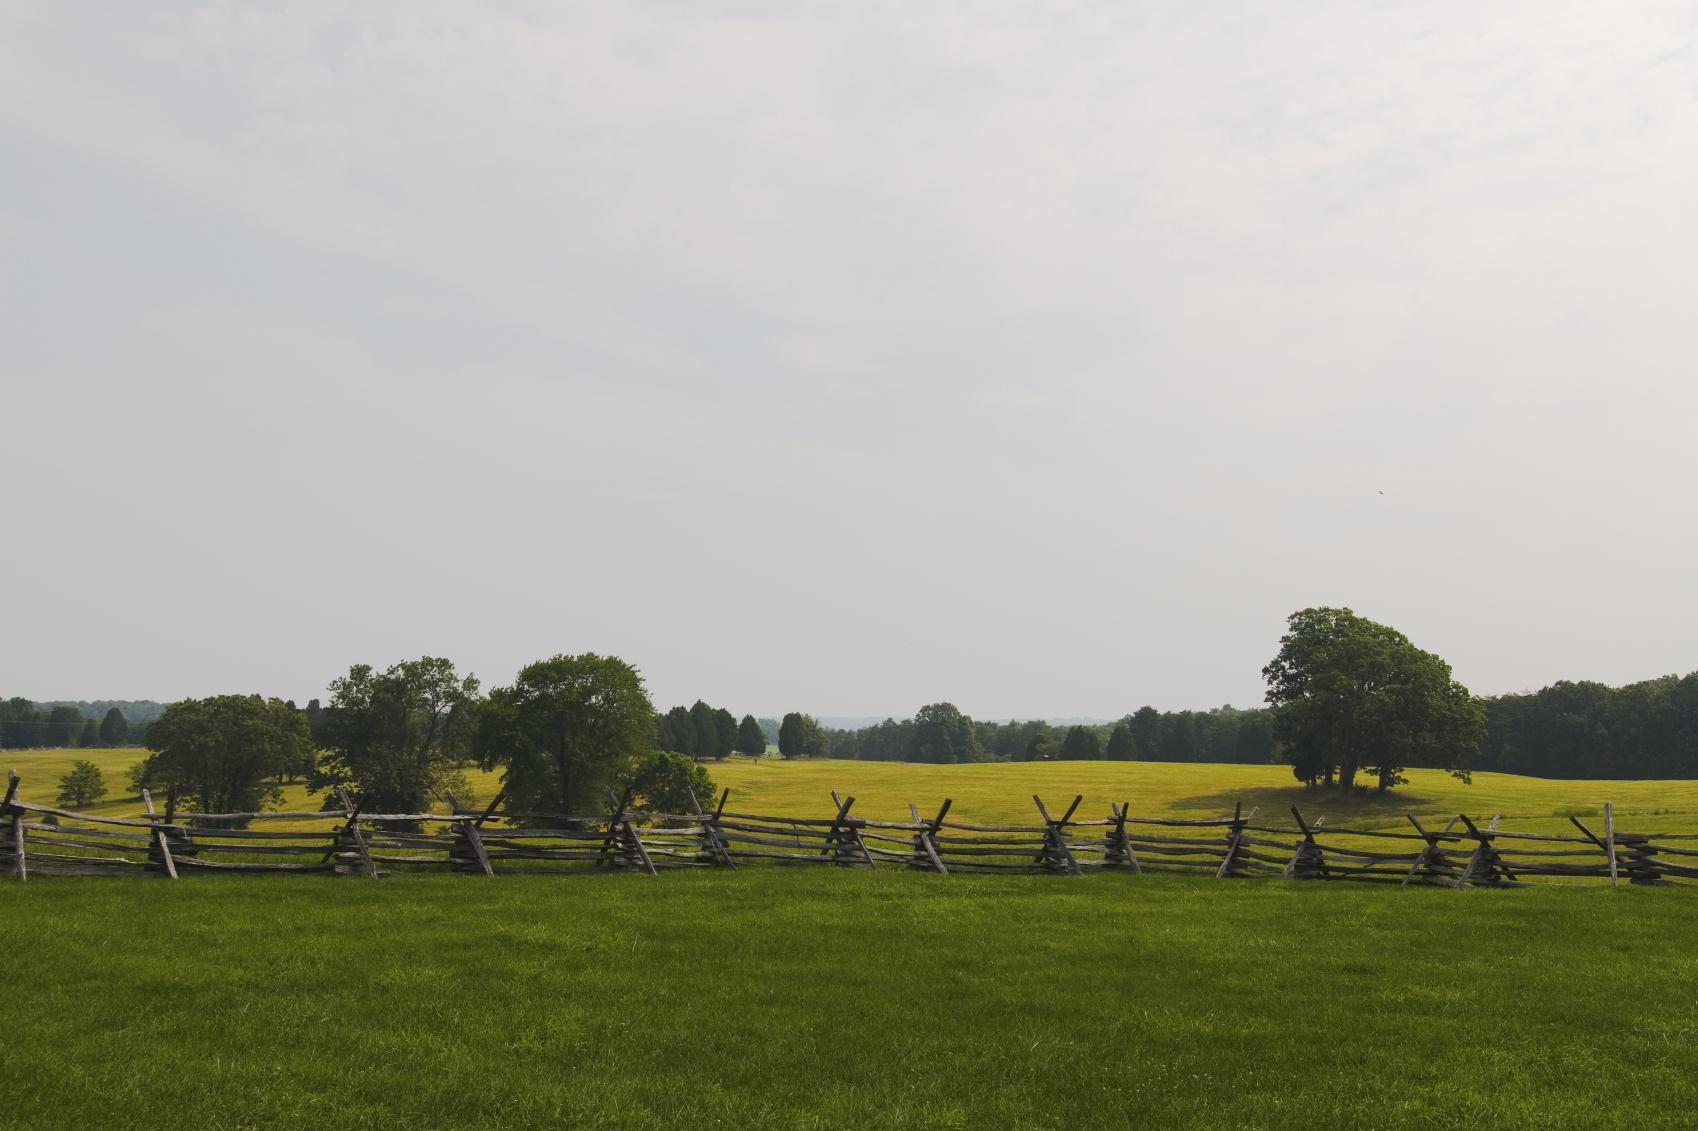 Gettysburg 150 Concerts Gettysburg 150 Concerts Is Music